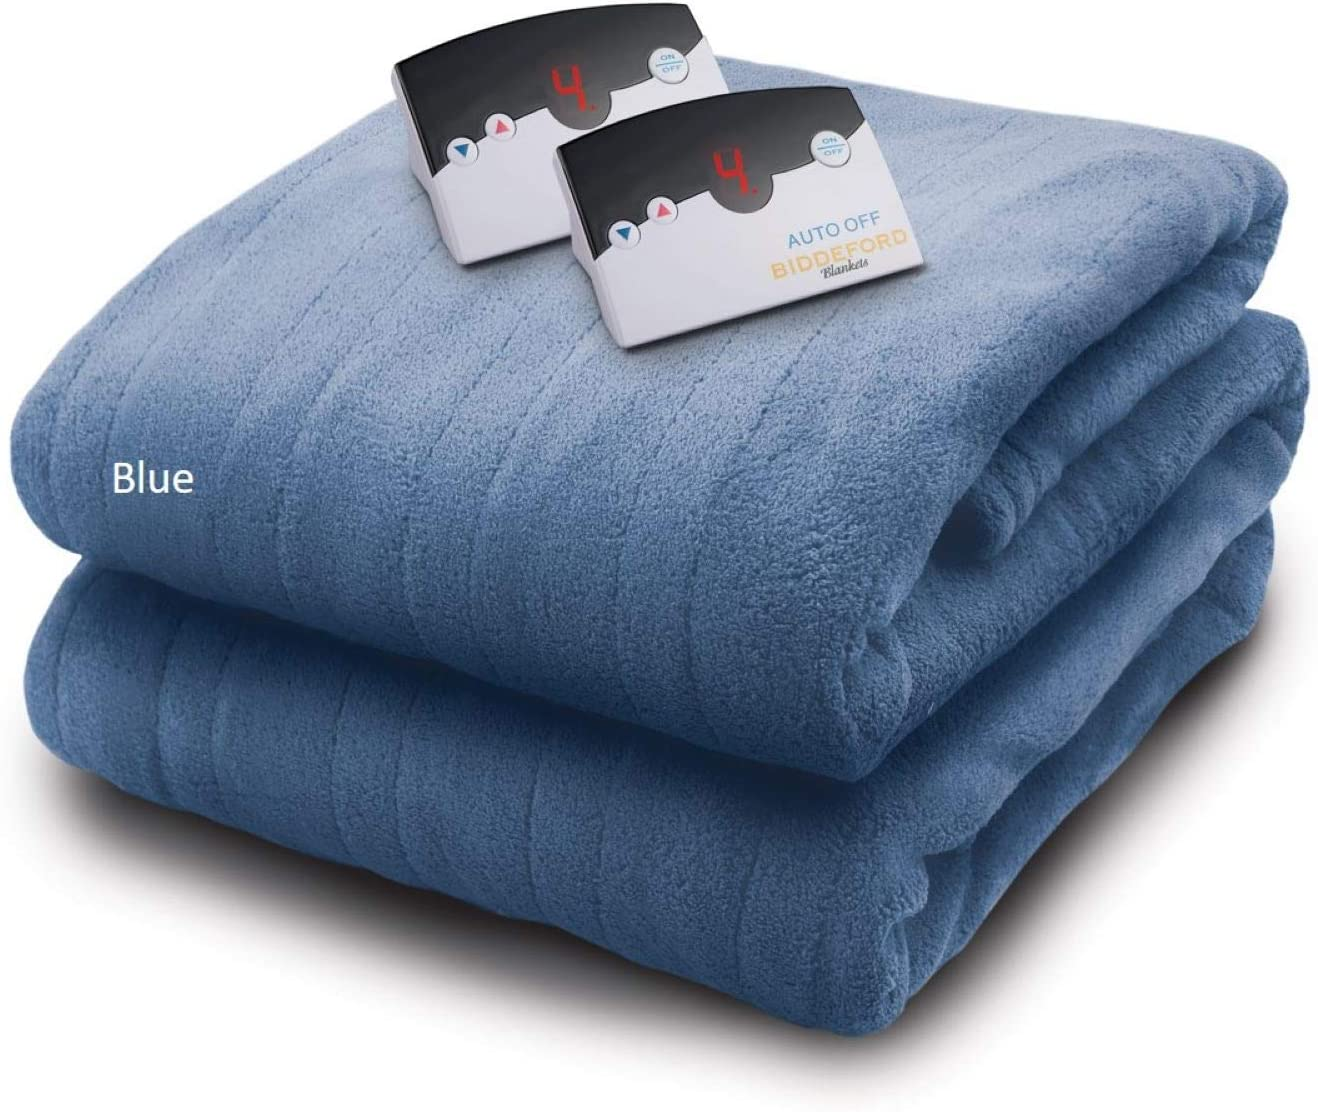 Biddeford Blankets Micro Plush Electric Heated Throw with Digital Controller